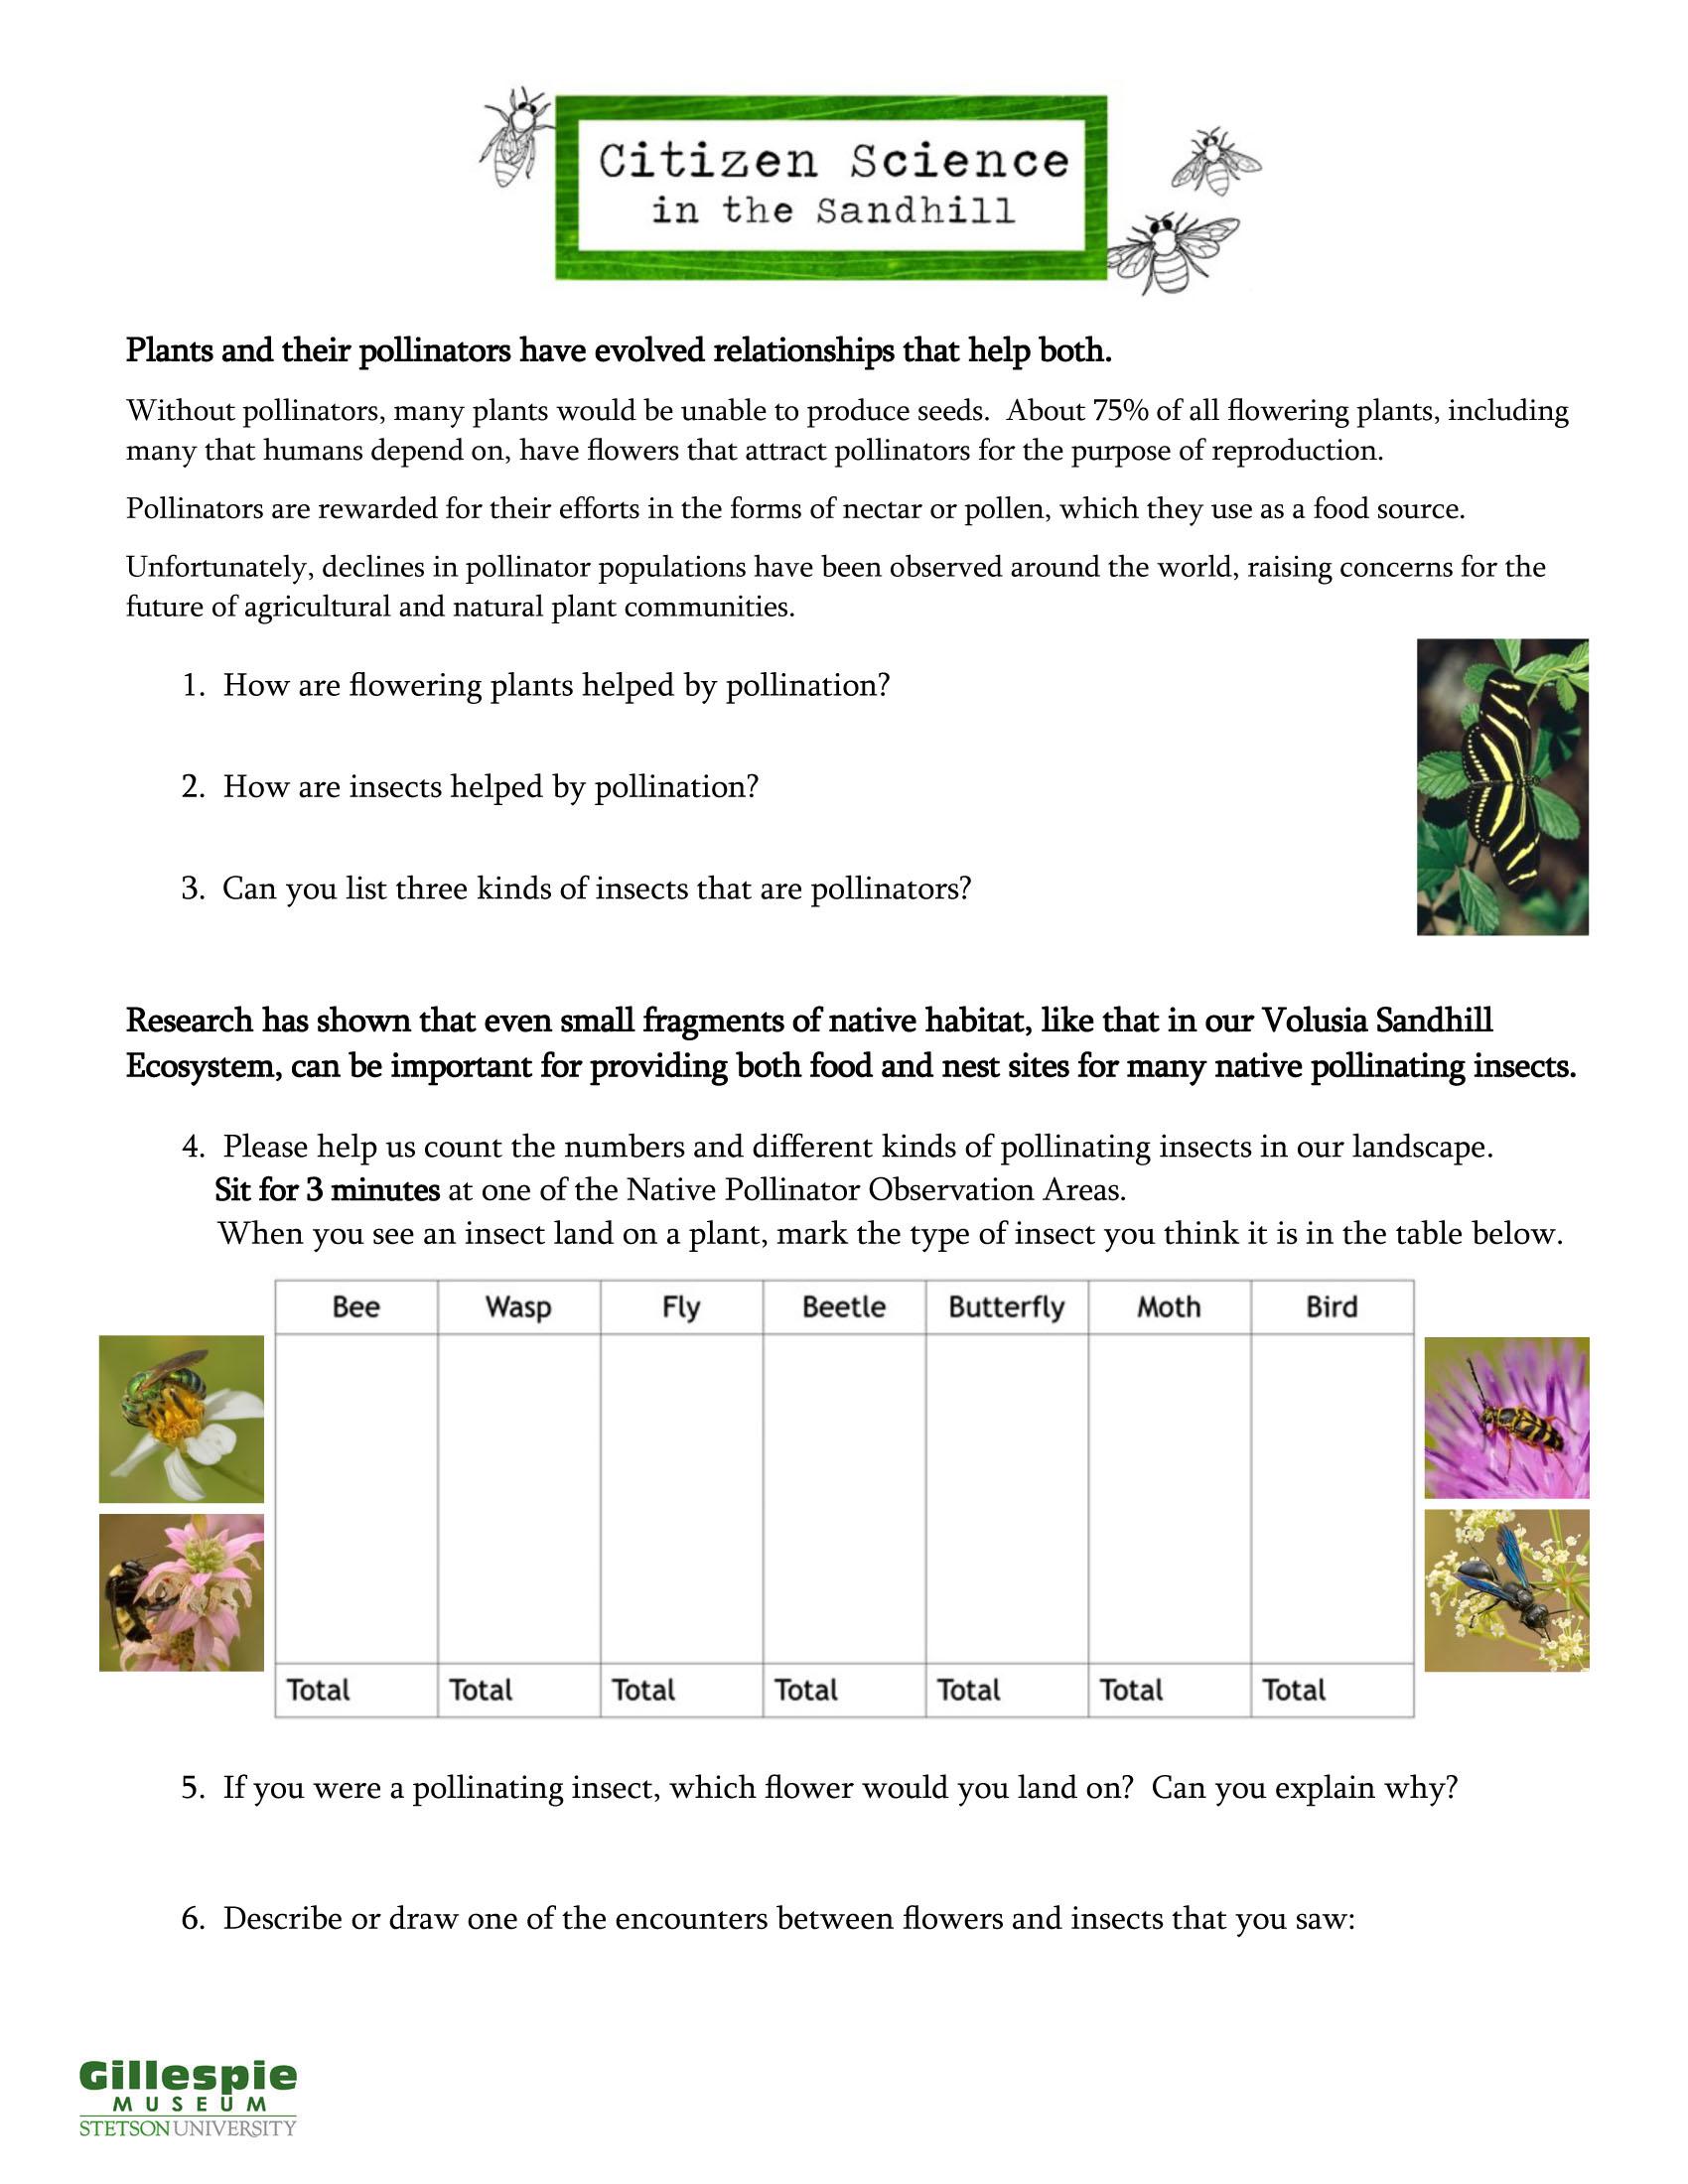 sandhill citizen science